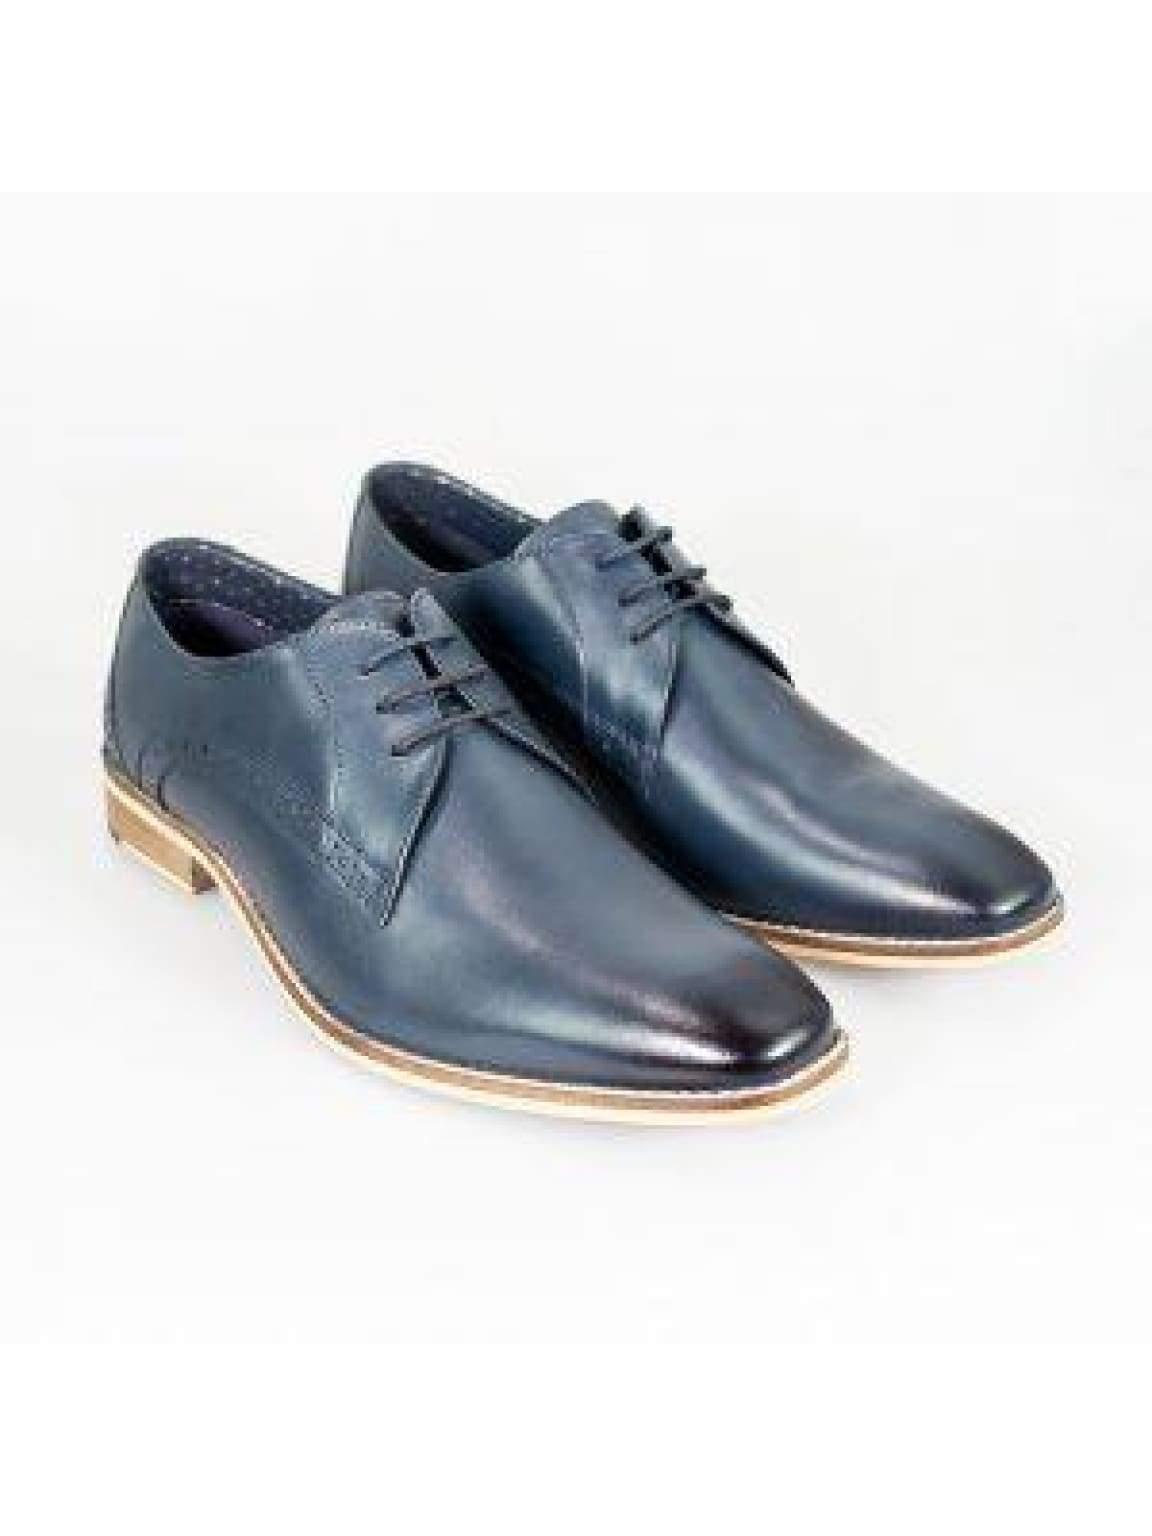 Cavani John Navy Mens Leather Shoes - UK6 | EU40 - Shoes